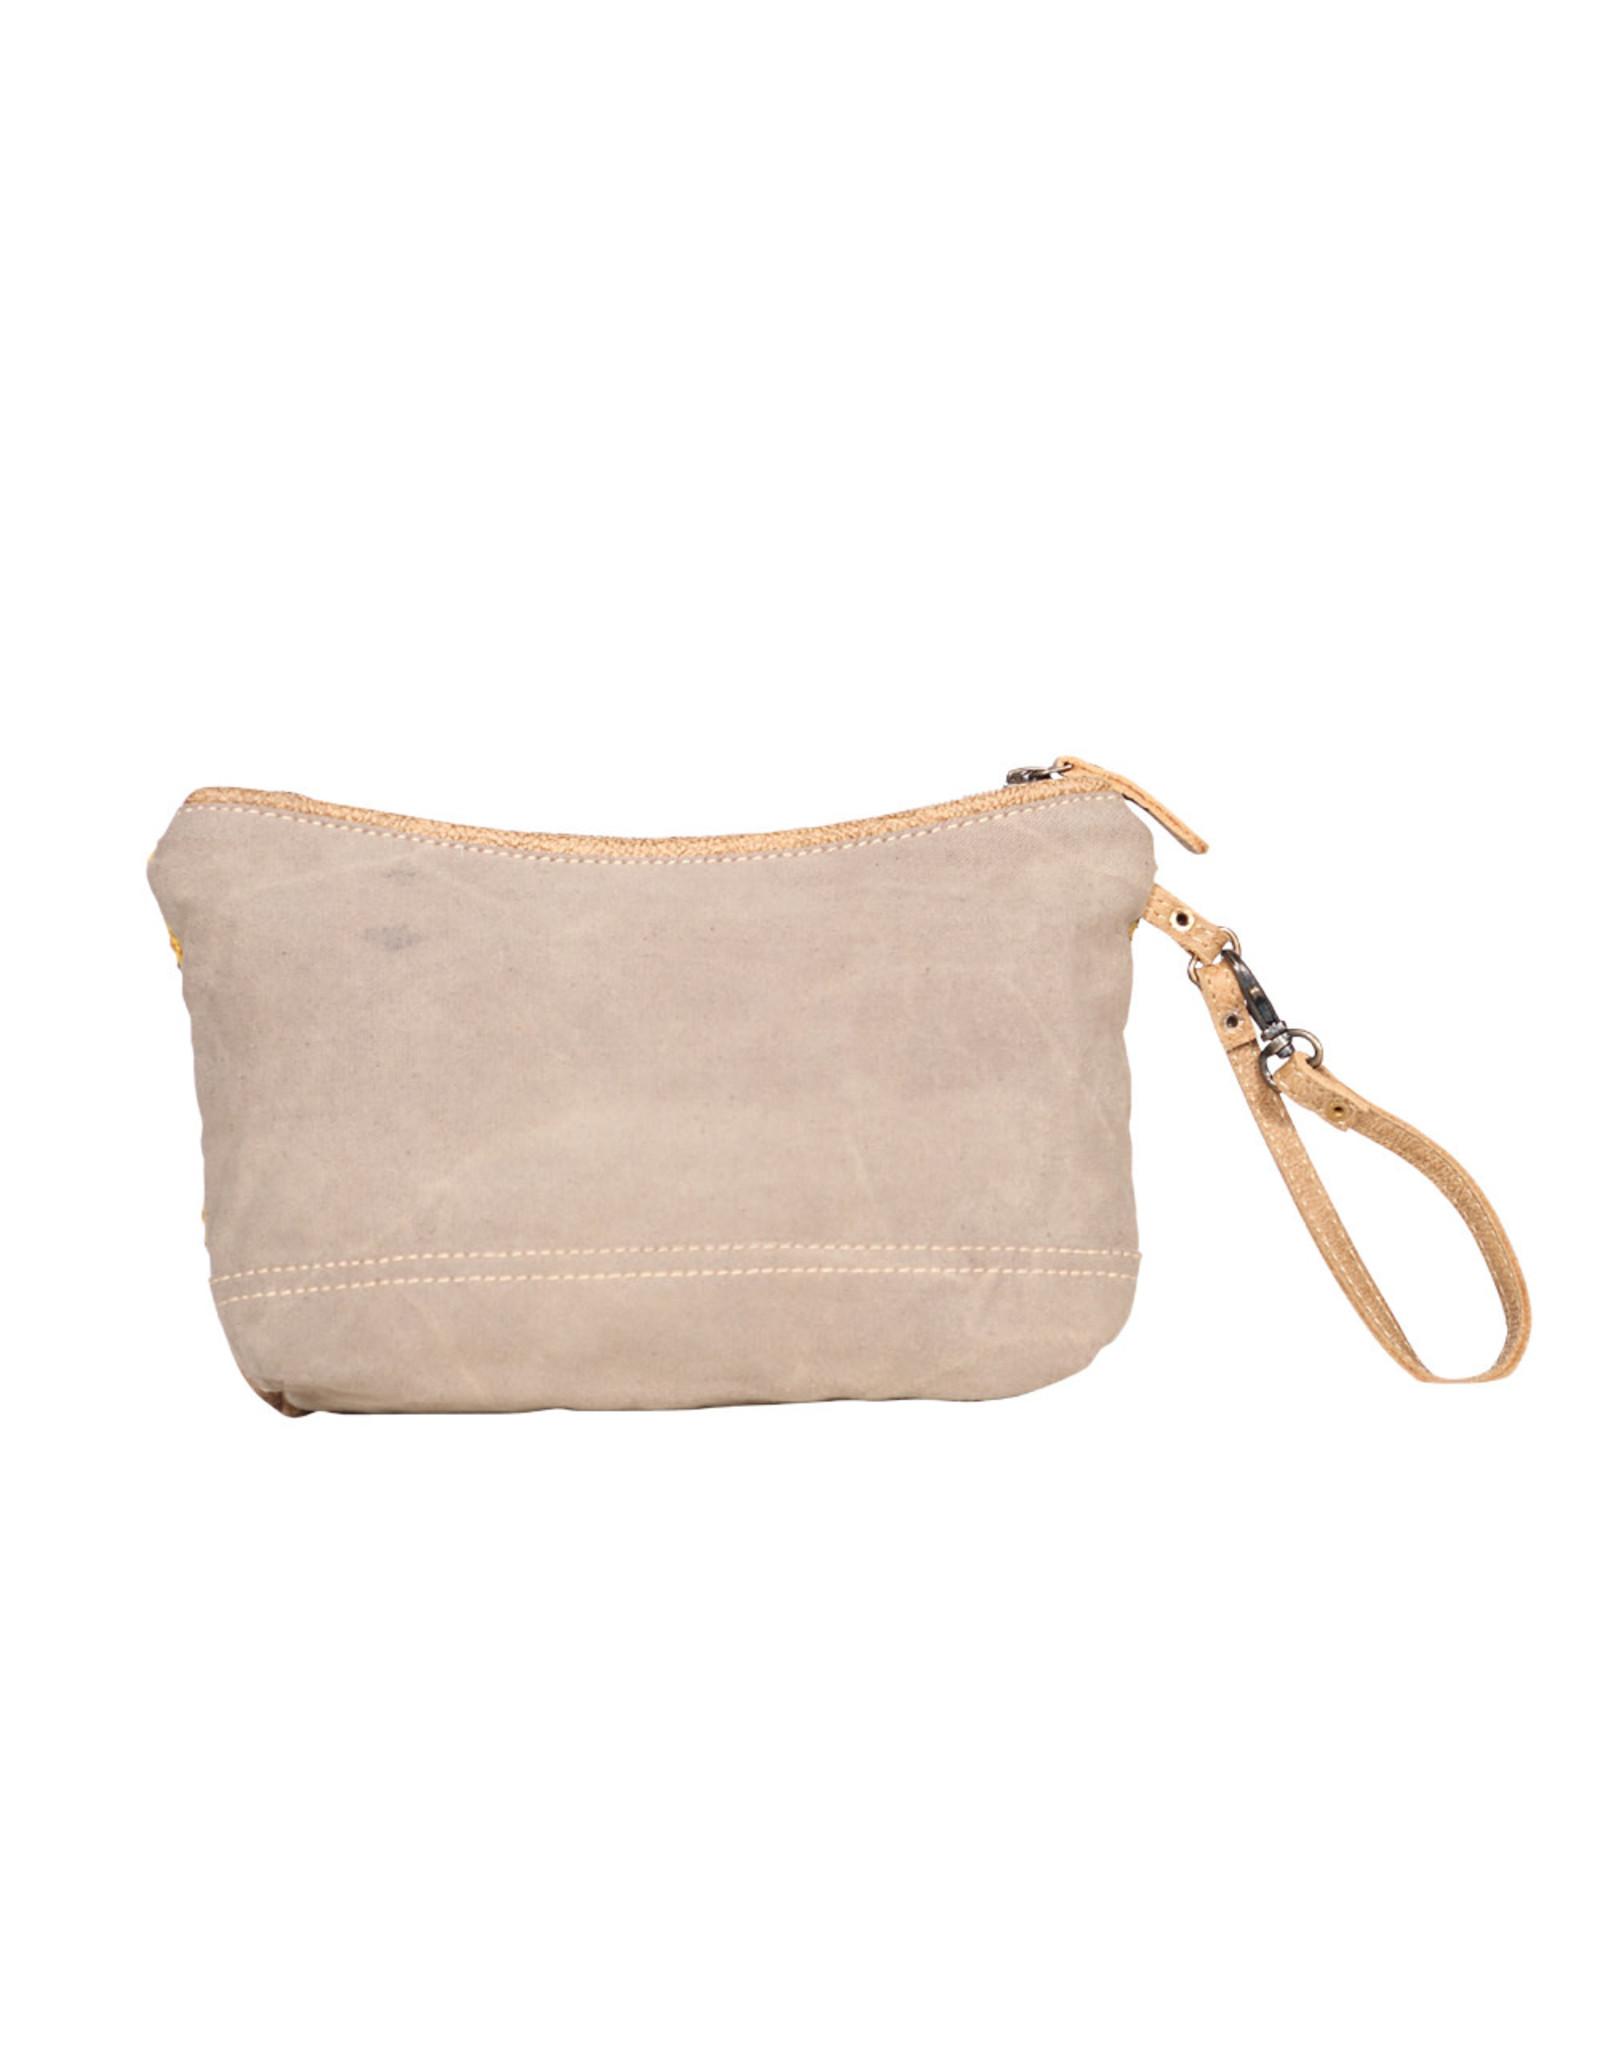 Myra Bags S-1983 Daily Pouch / Wristlet